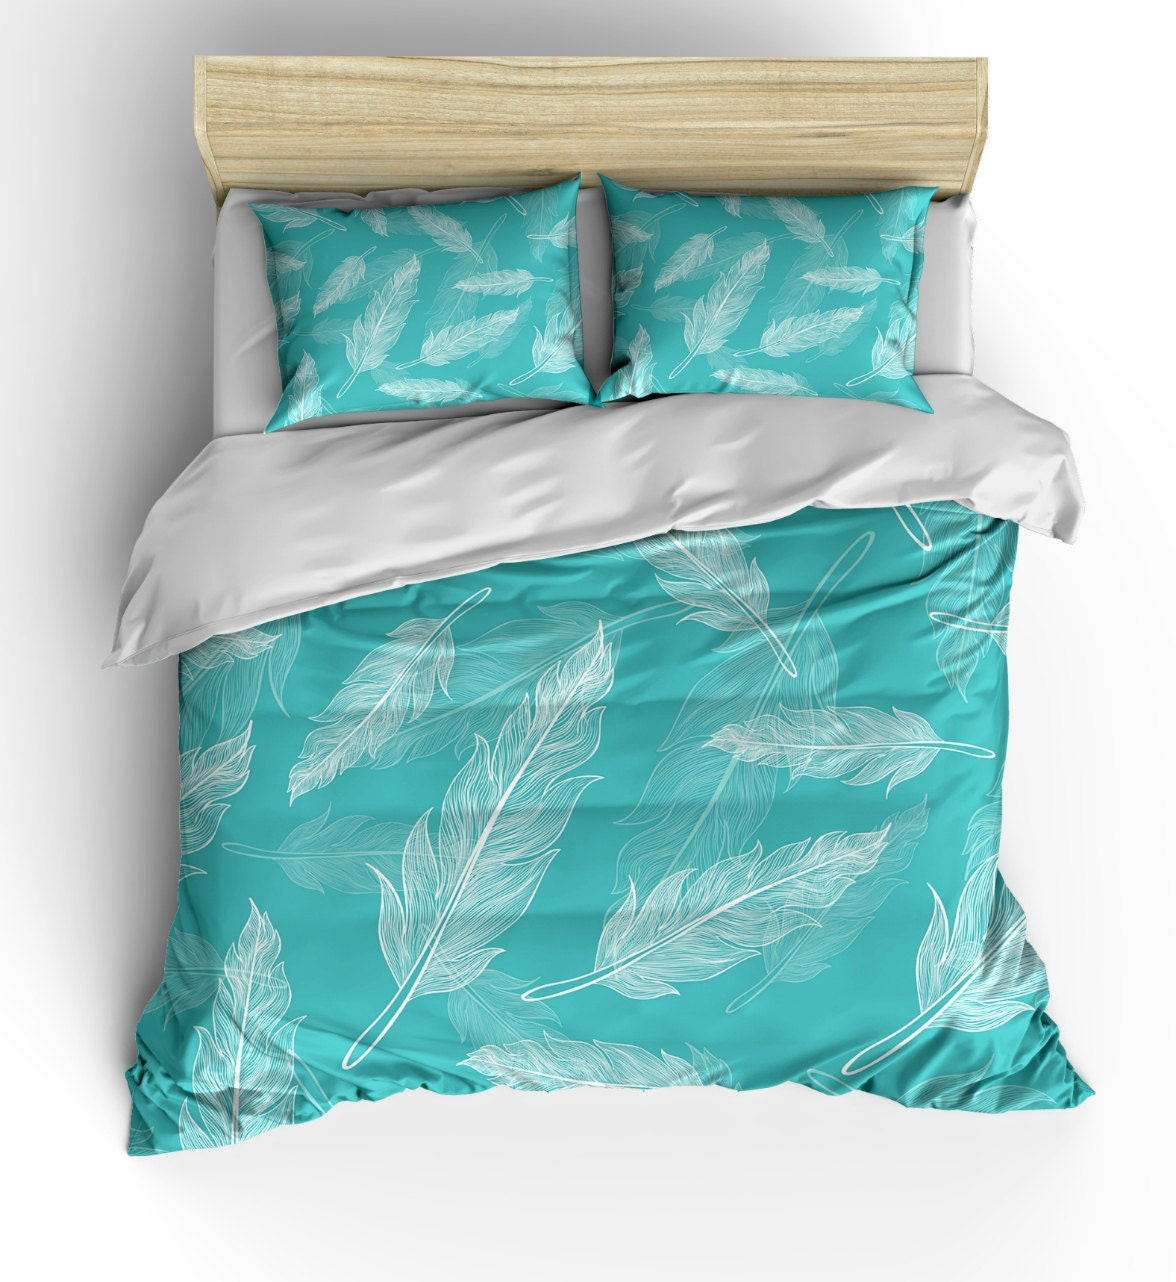 Teal Feather Design Bedding Duvet Setluxe Weight Comforter